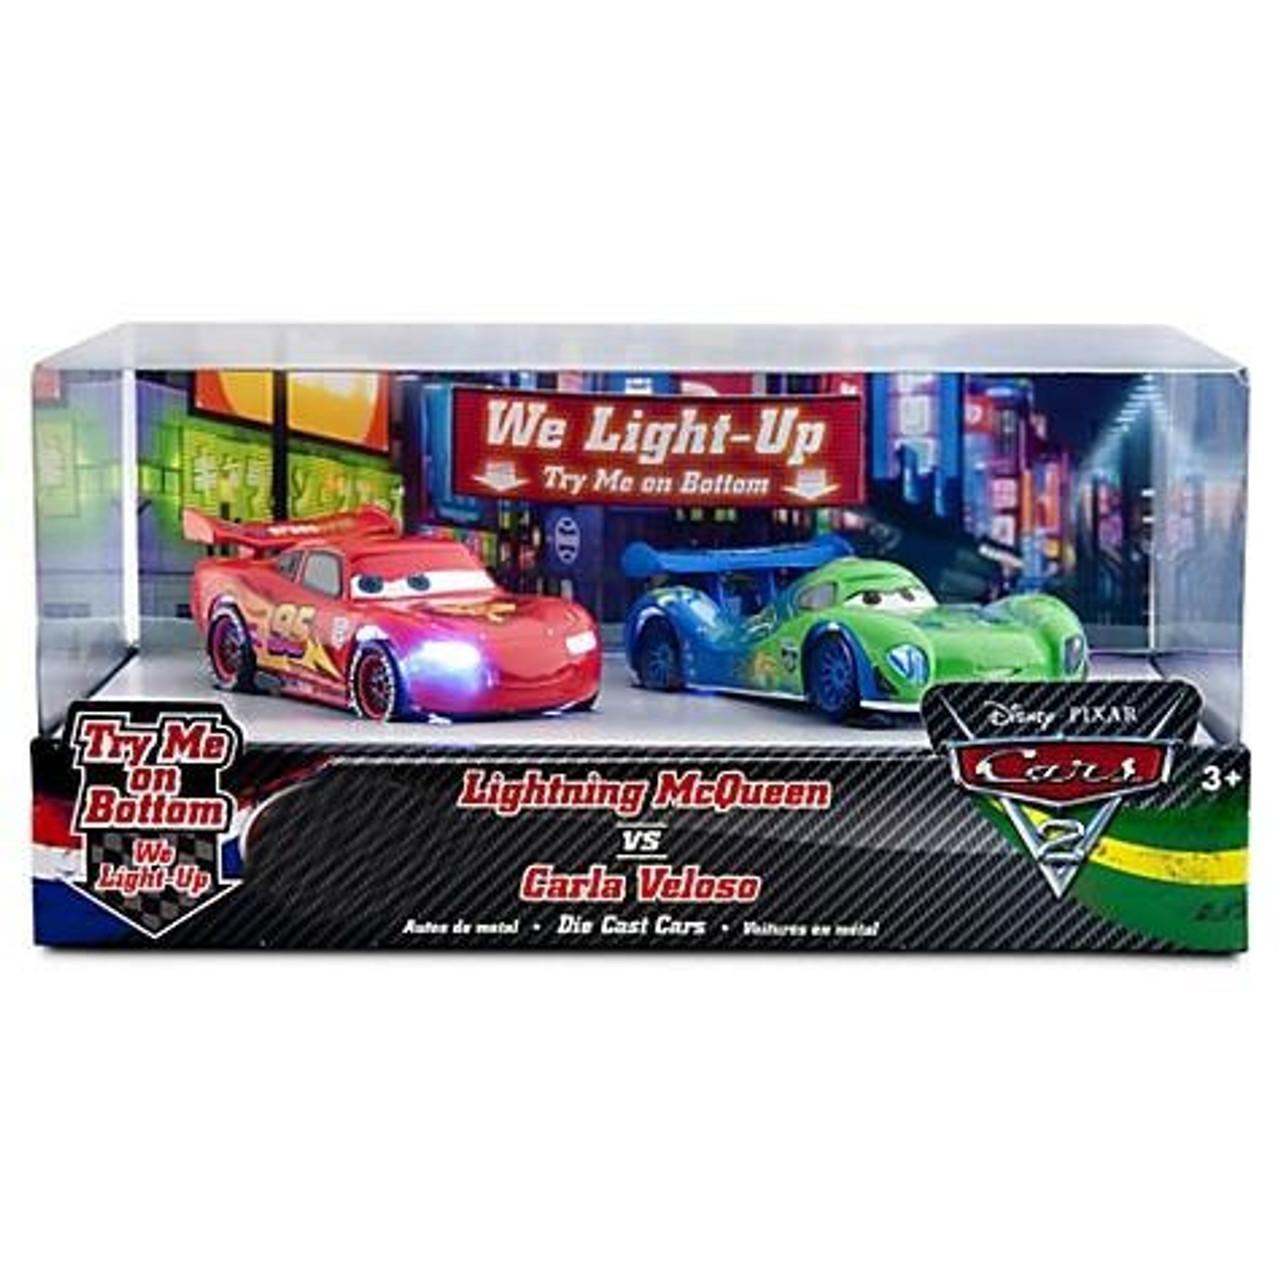 Disney Pixar Cars Cars 2 Light Up Lightning Mcqueen Vs Carla Veloso Exclusive 143 Diecast Car Set Toywiz